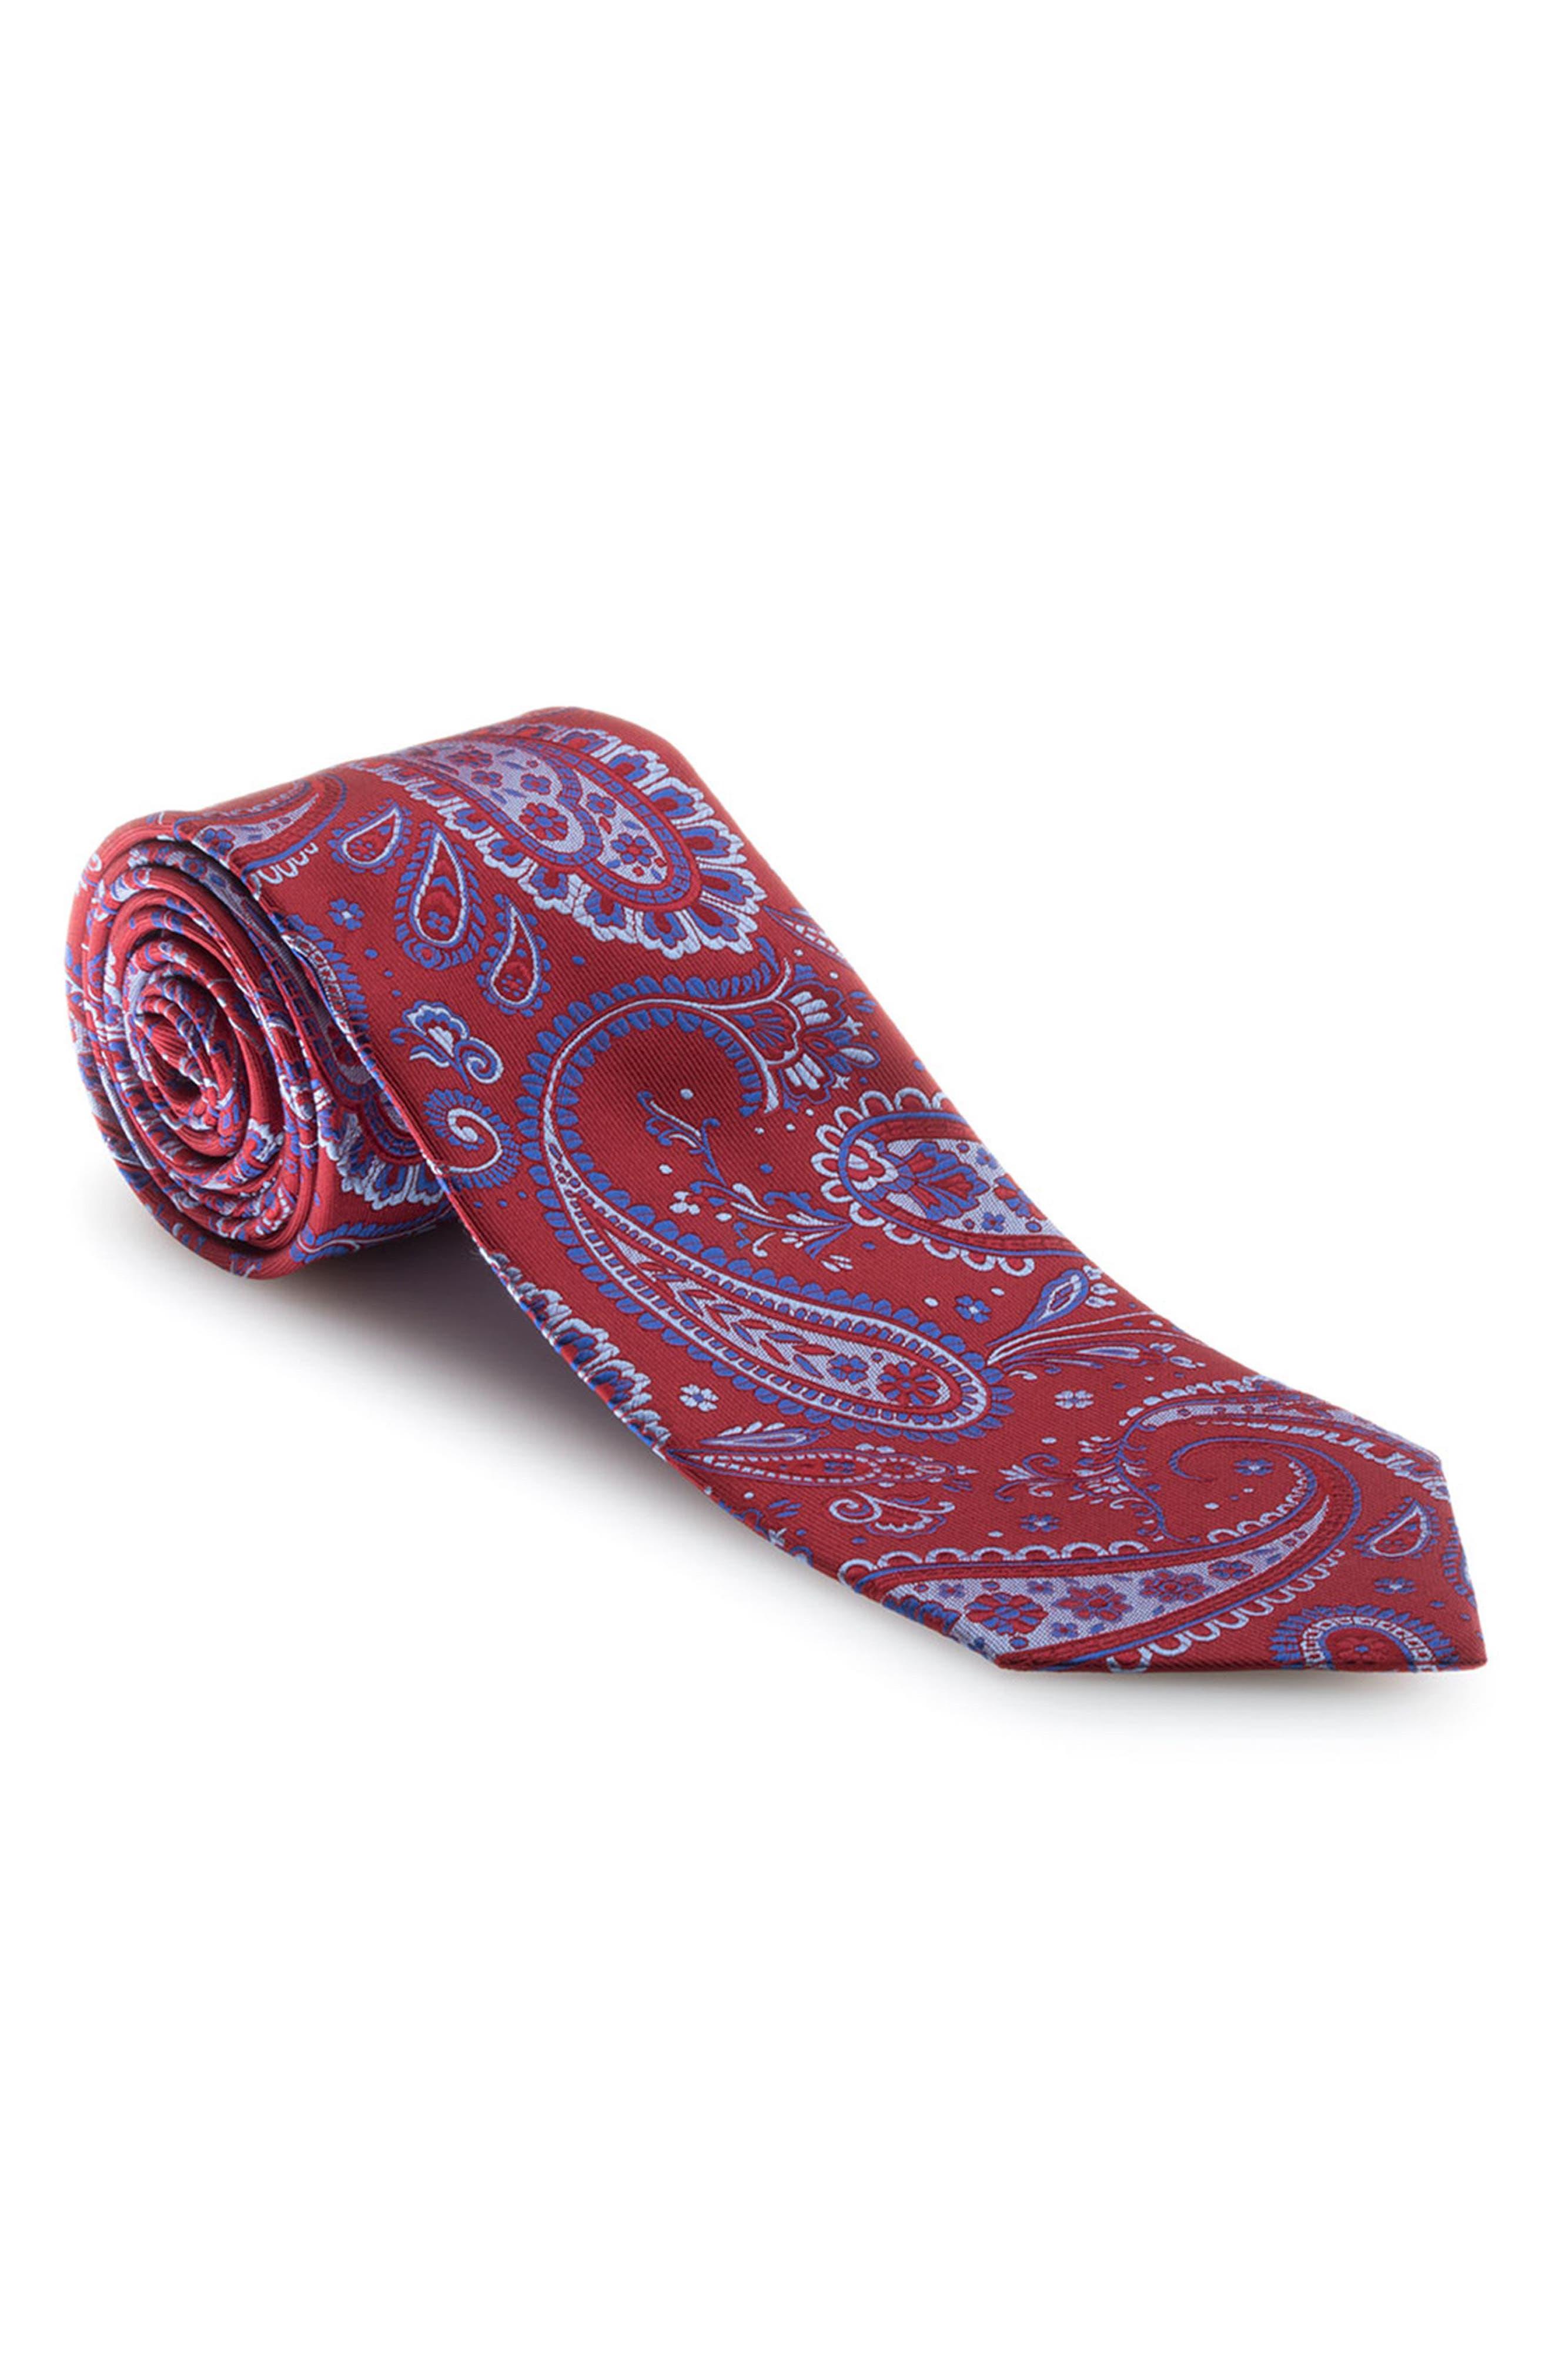 Alternate Image 1 Selected - Robert Talbott Paisley Silk Tie